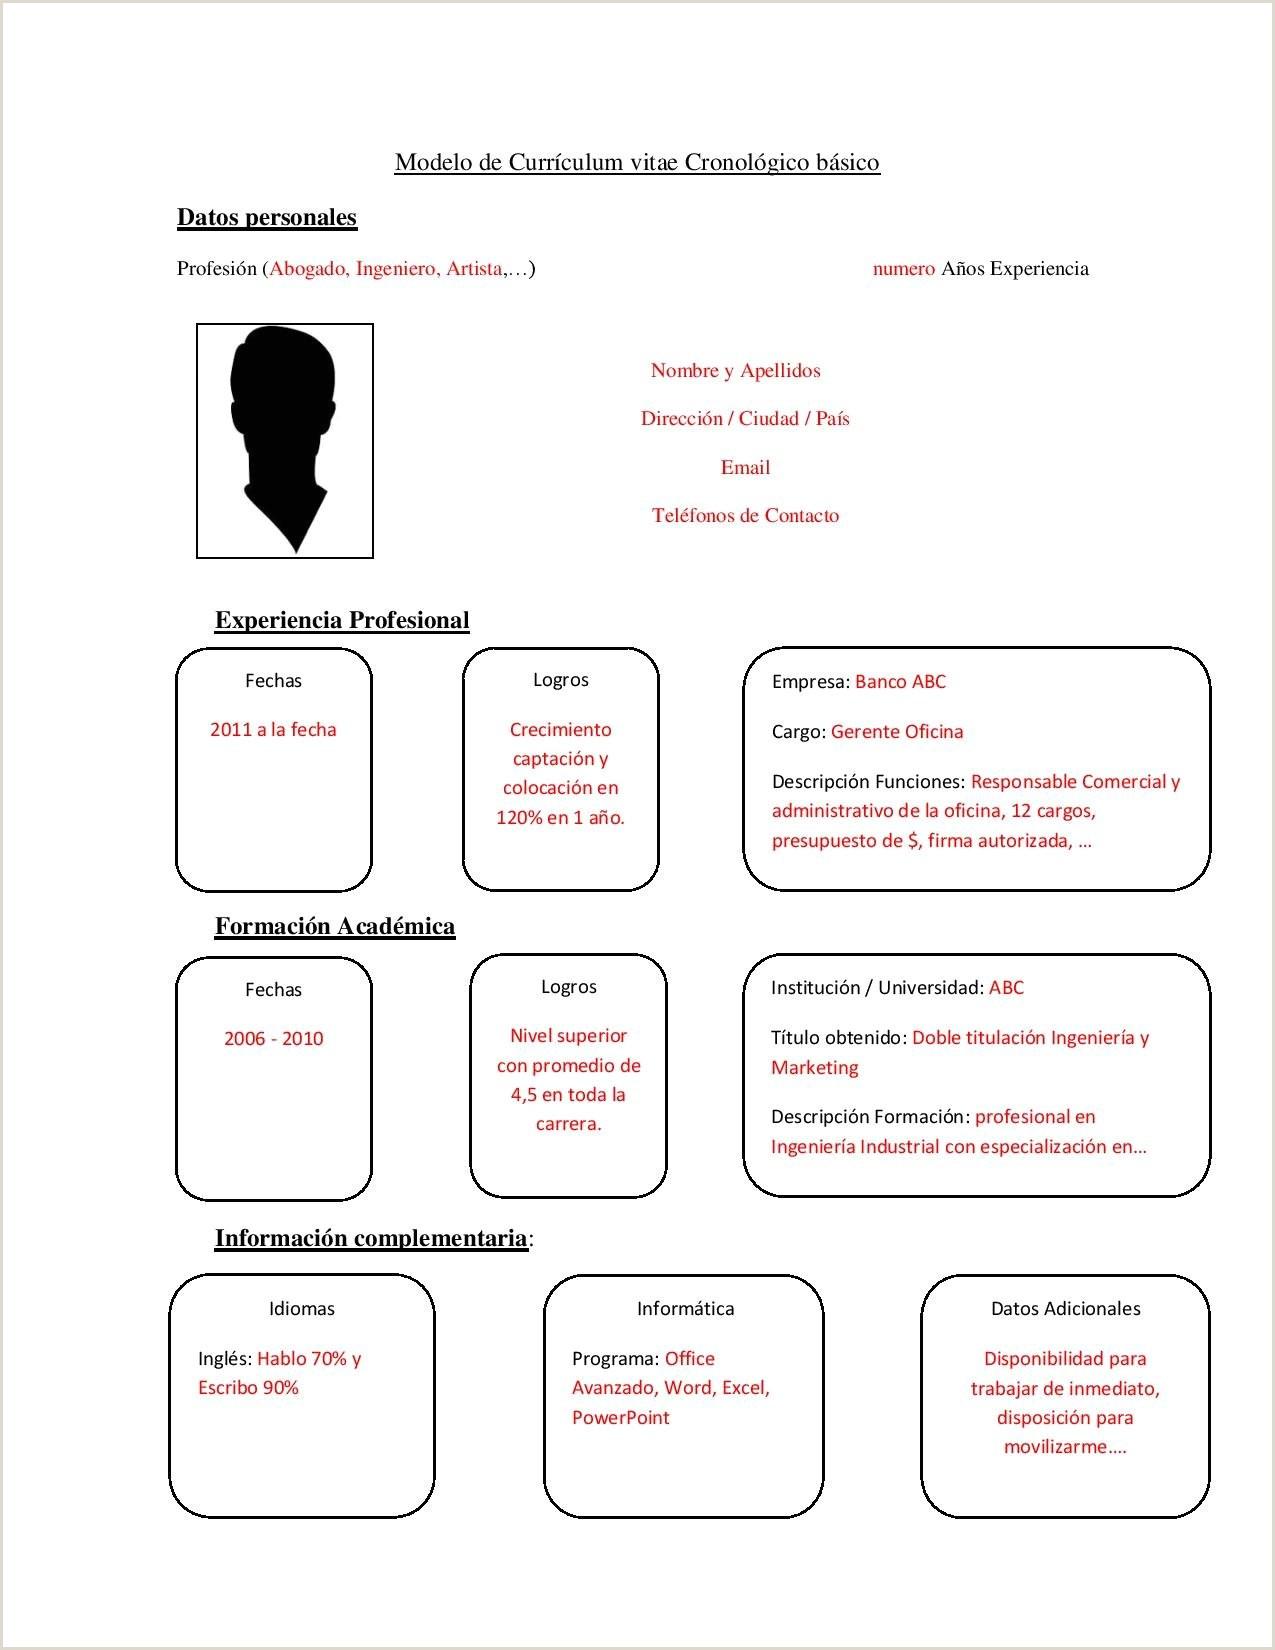 Datos Para Rellenar Un Curriculum Vitae Curriculum Vitae Plantilla Word Para Rellenar